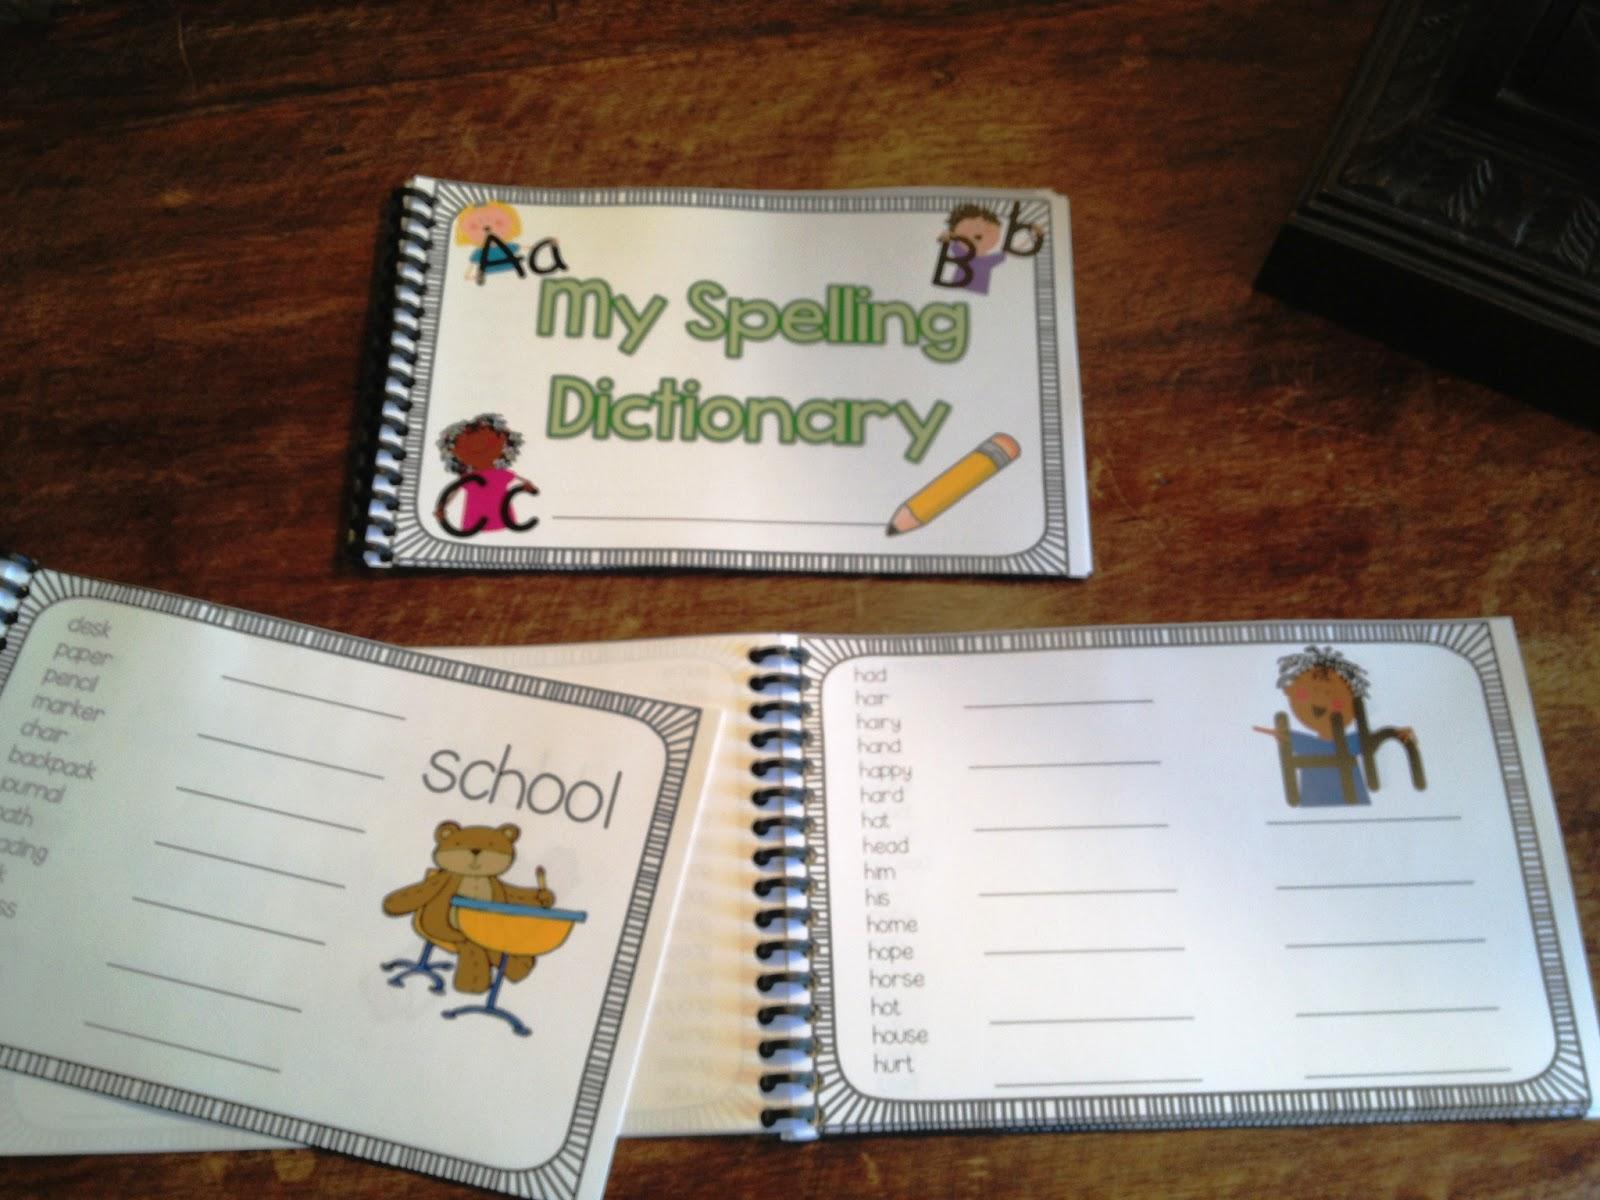 tunstall u0026 39 s teaching tidbits  how do you spell